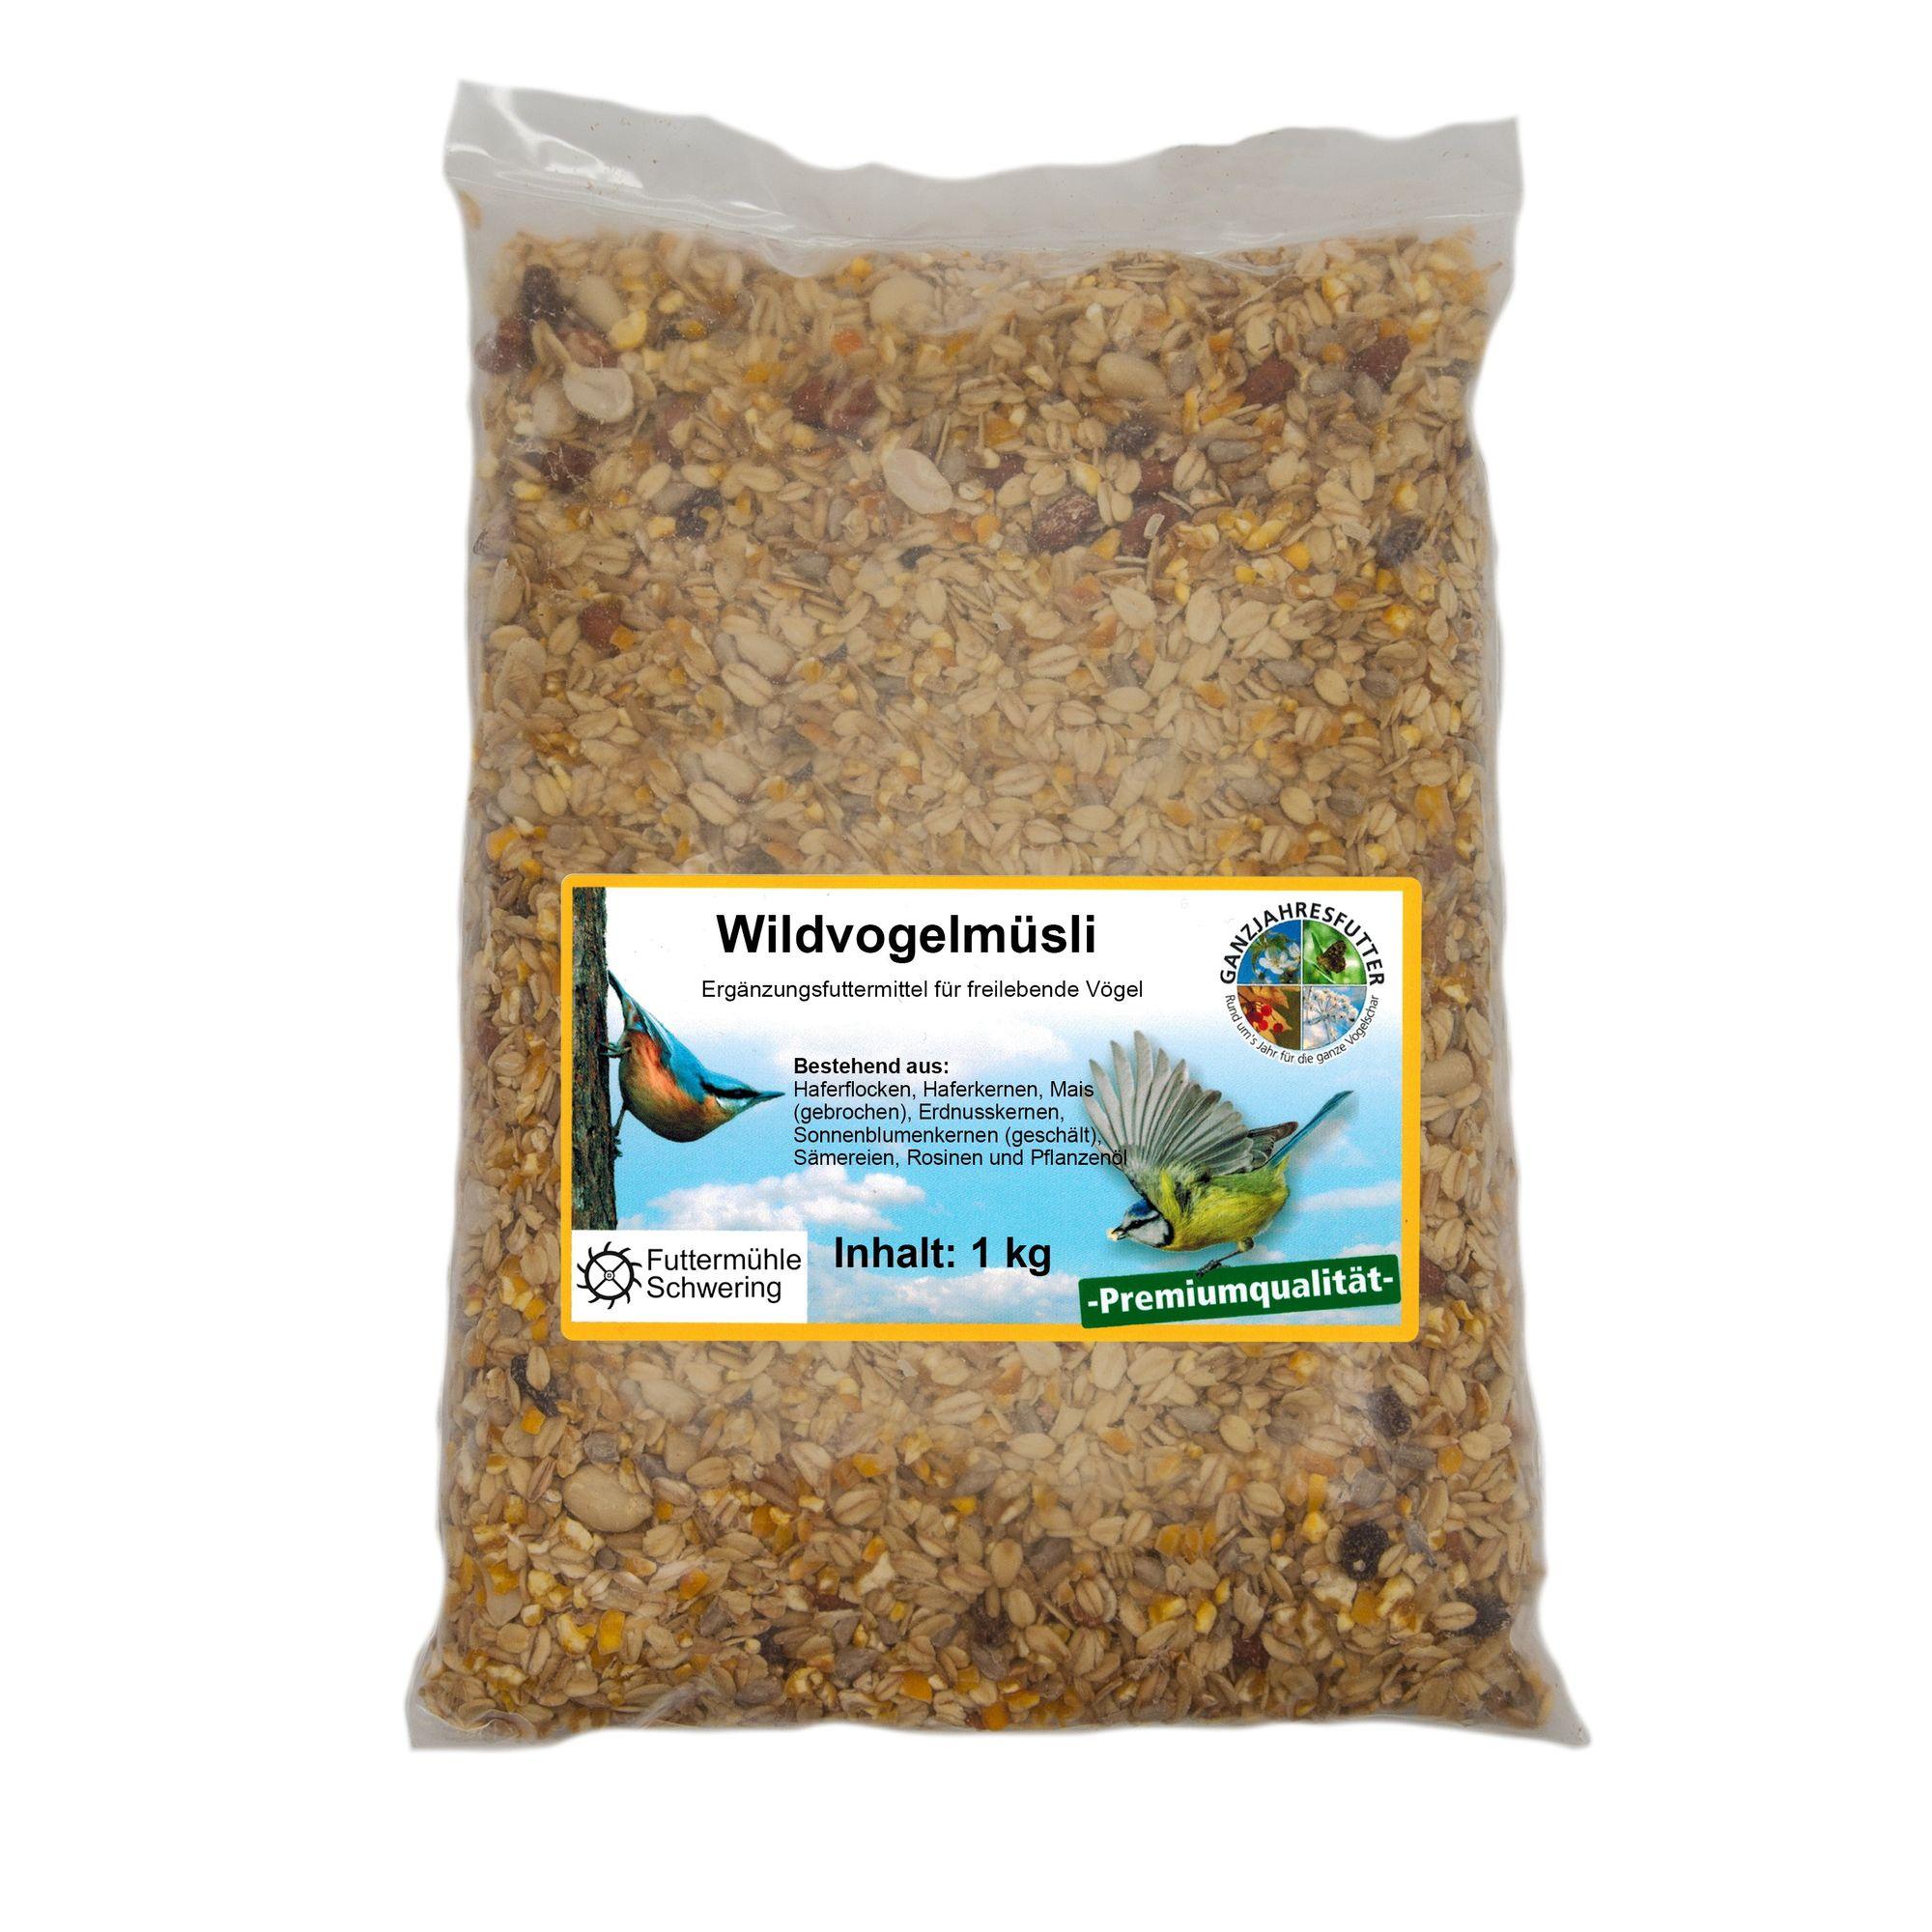 Wildvogelfutter Streupaket mit 5 Sorten Futter je 1kg